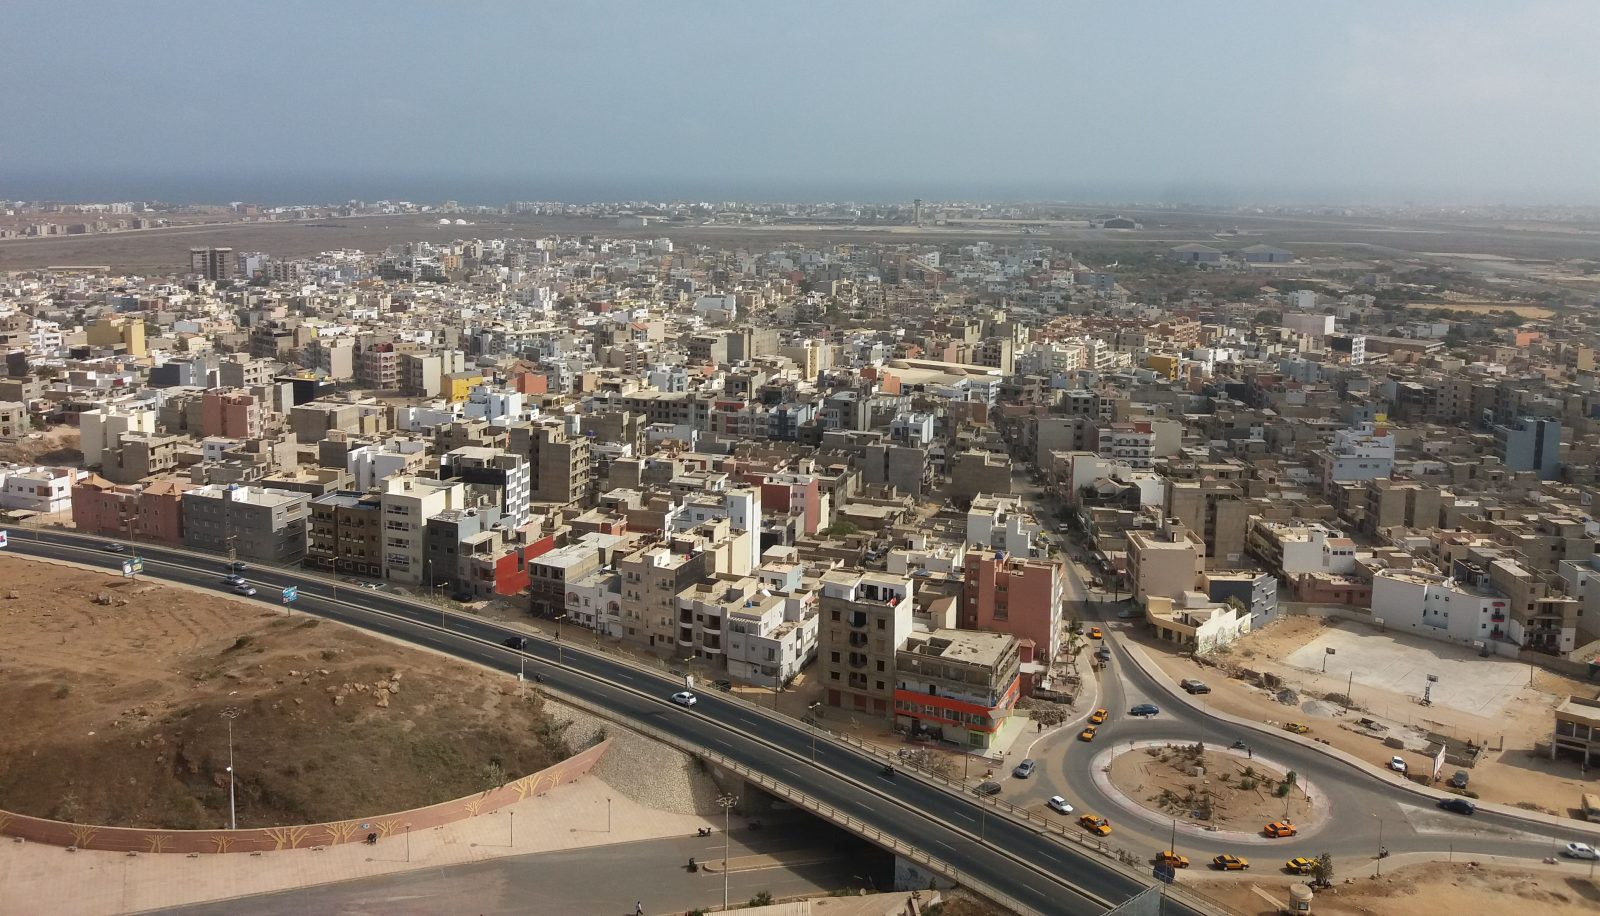 Vue de la ville de Dakar. Photo : Annadjib Ramadane.